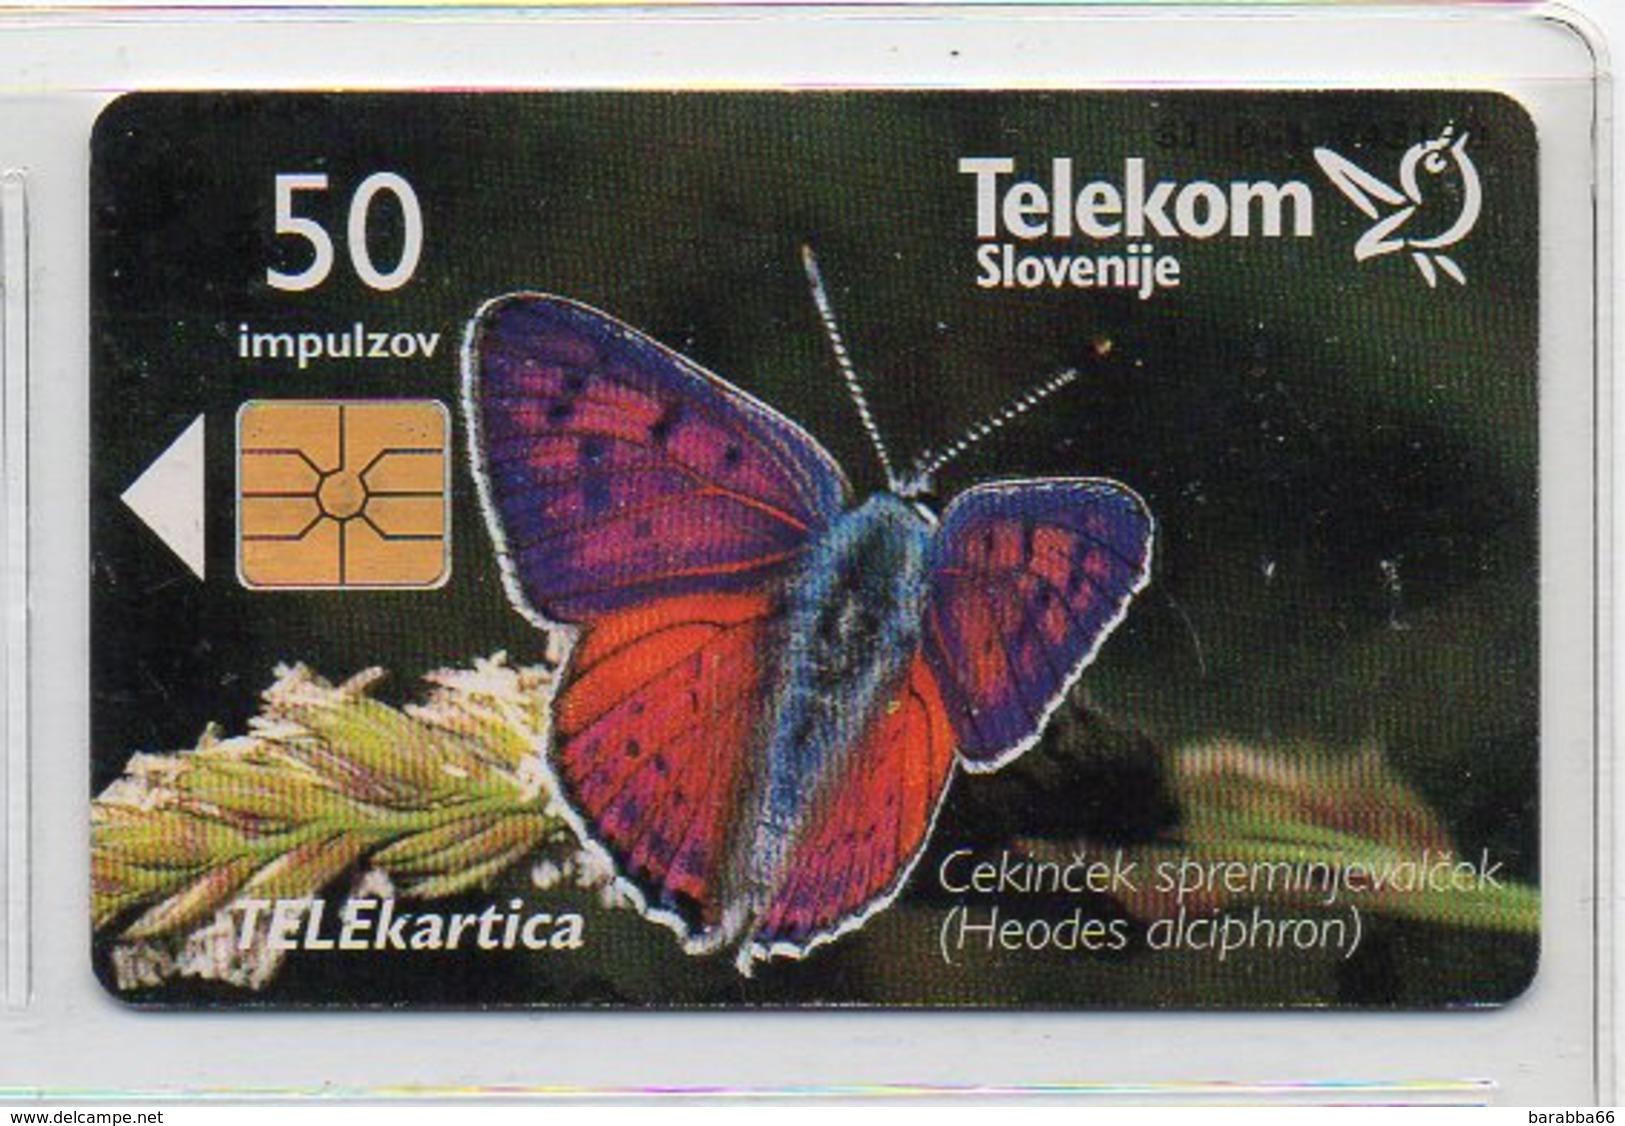 Telekom Slovenije 50 Imp. - CEKINČEK ... - Slowenien